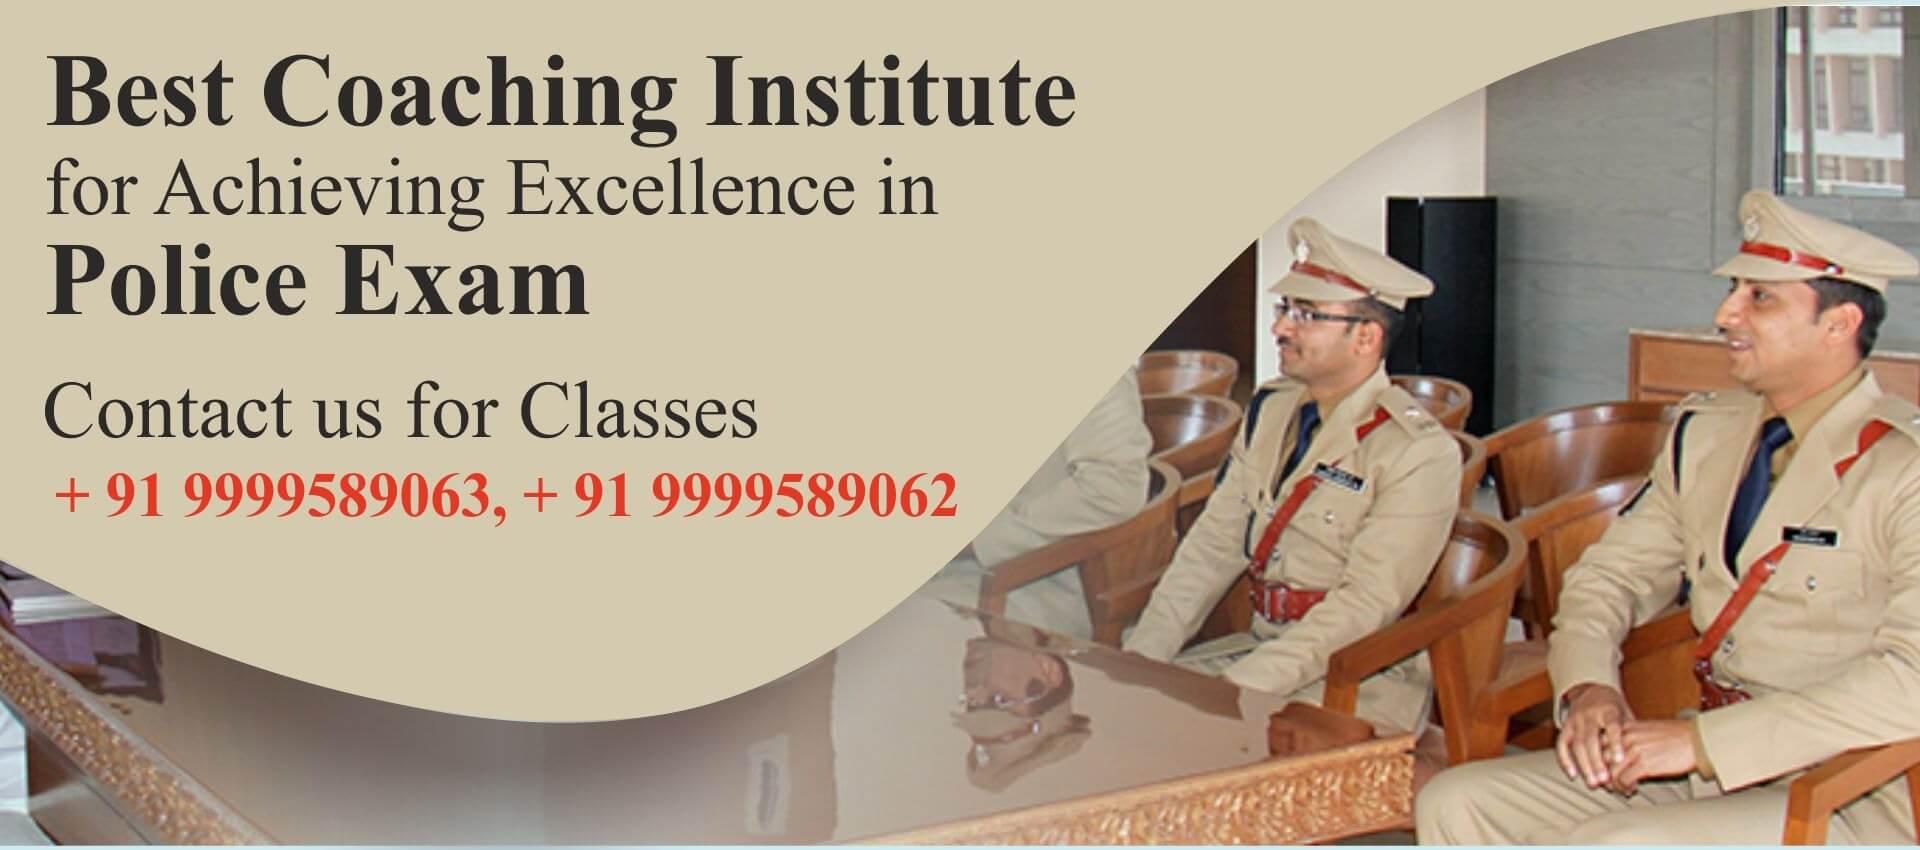 Police Exam Coaching Delhi